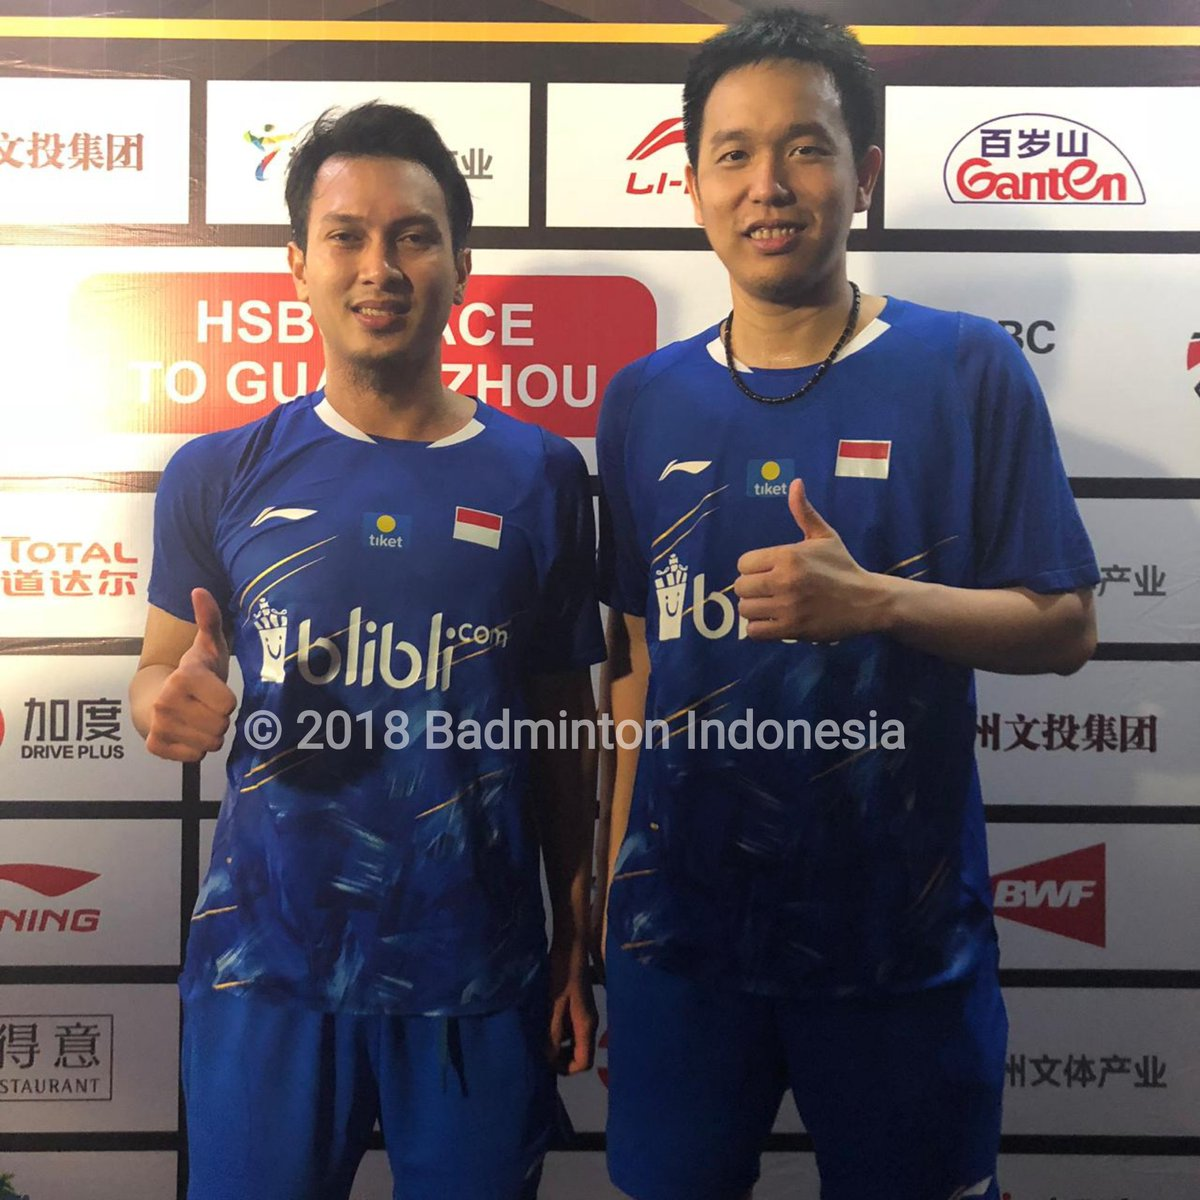 Pasangan ganda putra Indonesia, Mohammad Ahsan/Hendra Setiawan melaju ke babak 16 besar Fuzhou China Open 2018 setelah mengalahkan wakil China Taipe, Rabu (7/11/2018).